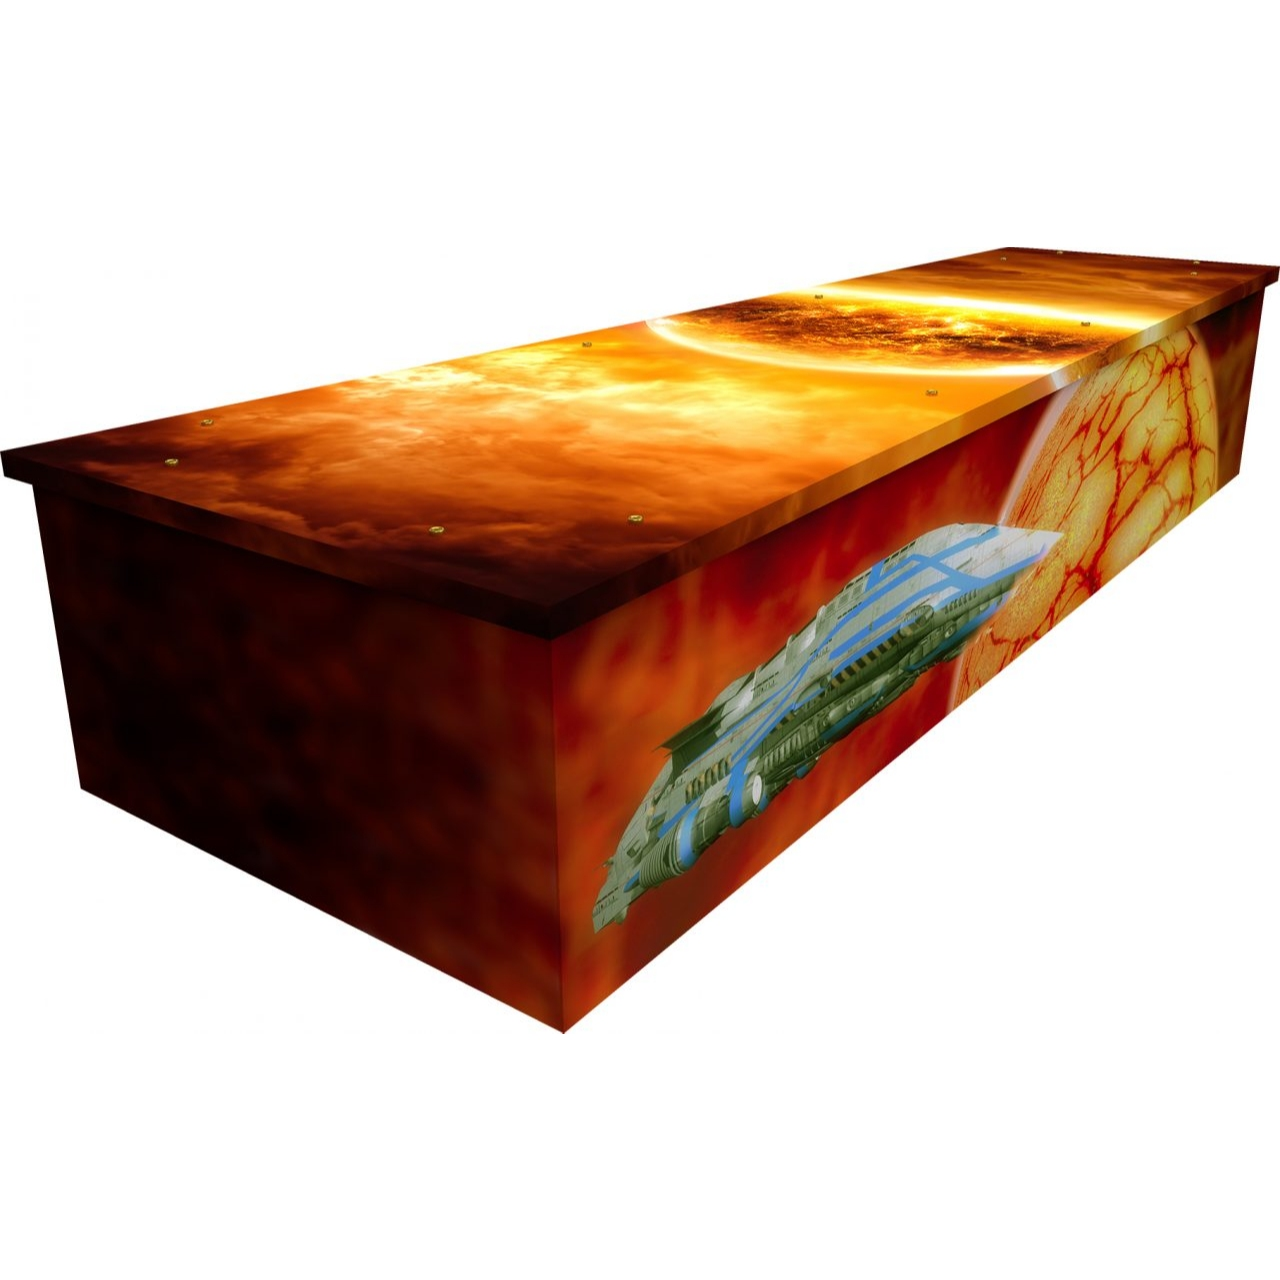 Space Fantasy Cardboard Coffin